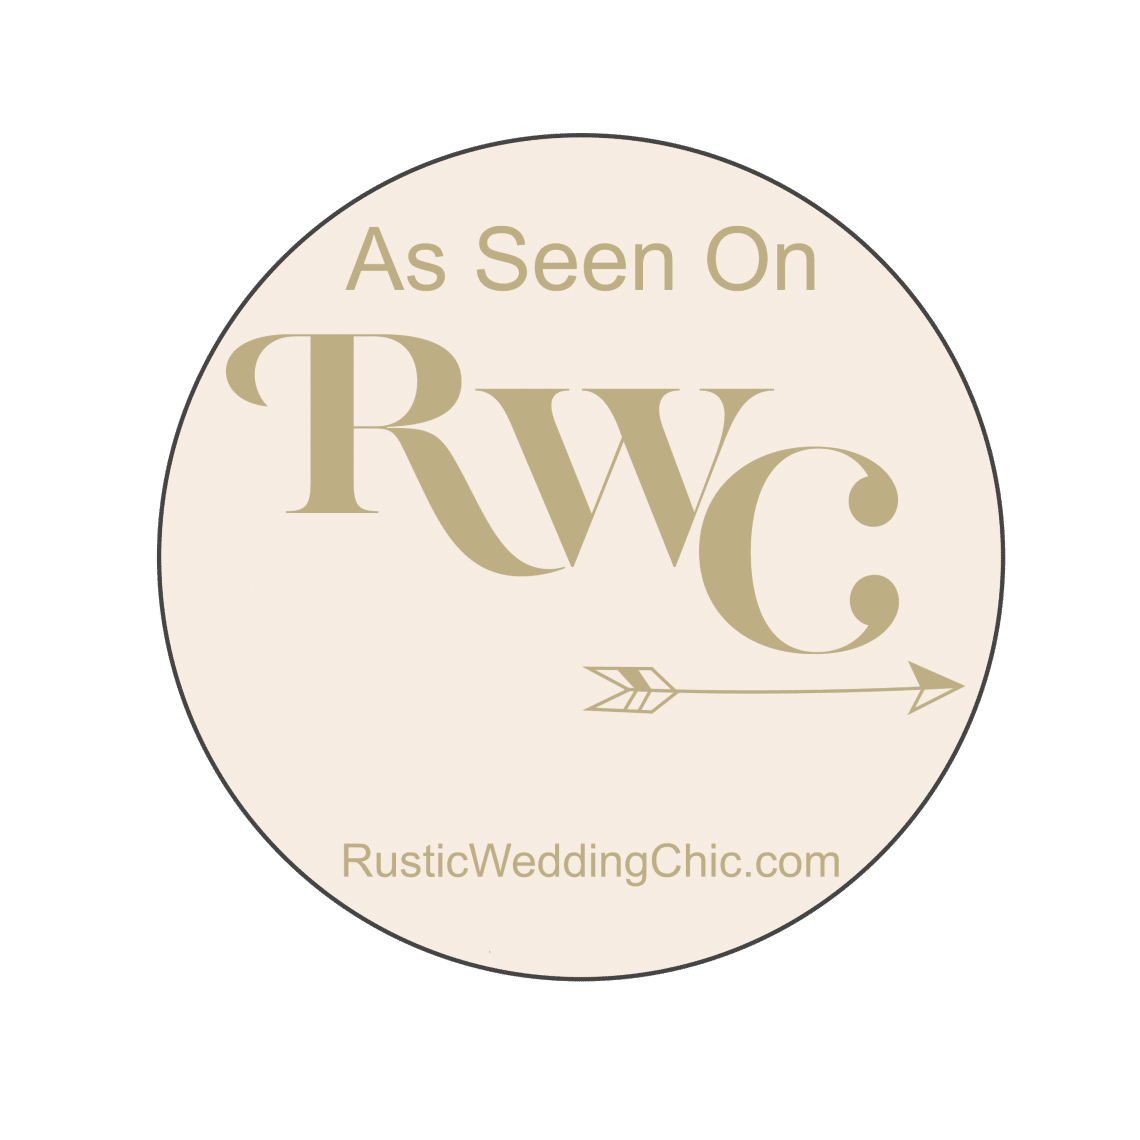 RWC_Circle_09-as-seen-on-1140x1140